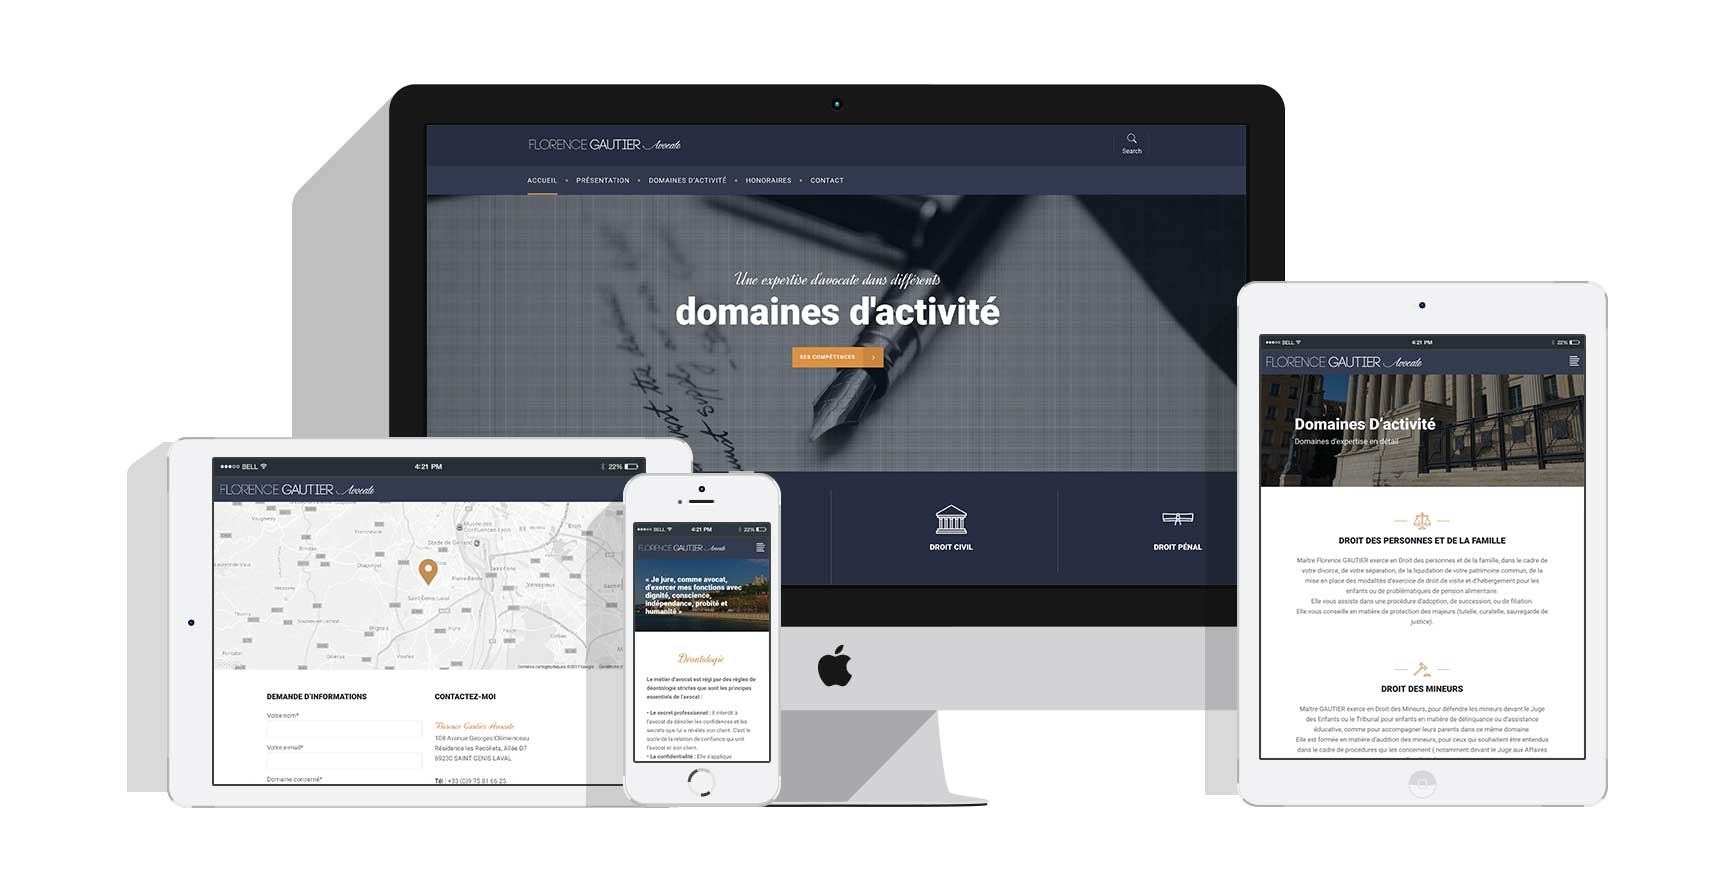 portfolio-florence-gautier-avocat-florence-borrel-flobo-design-graphique-infographie-webdesign-savoie-tarentaise-meribel-menuires-courchevel